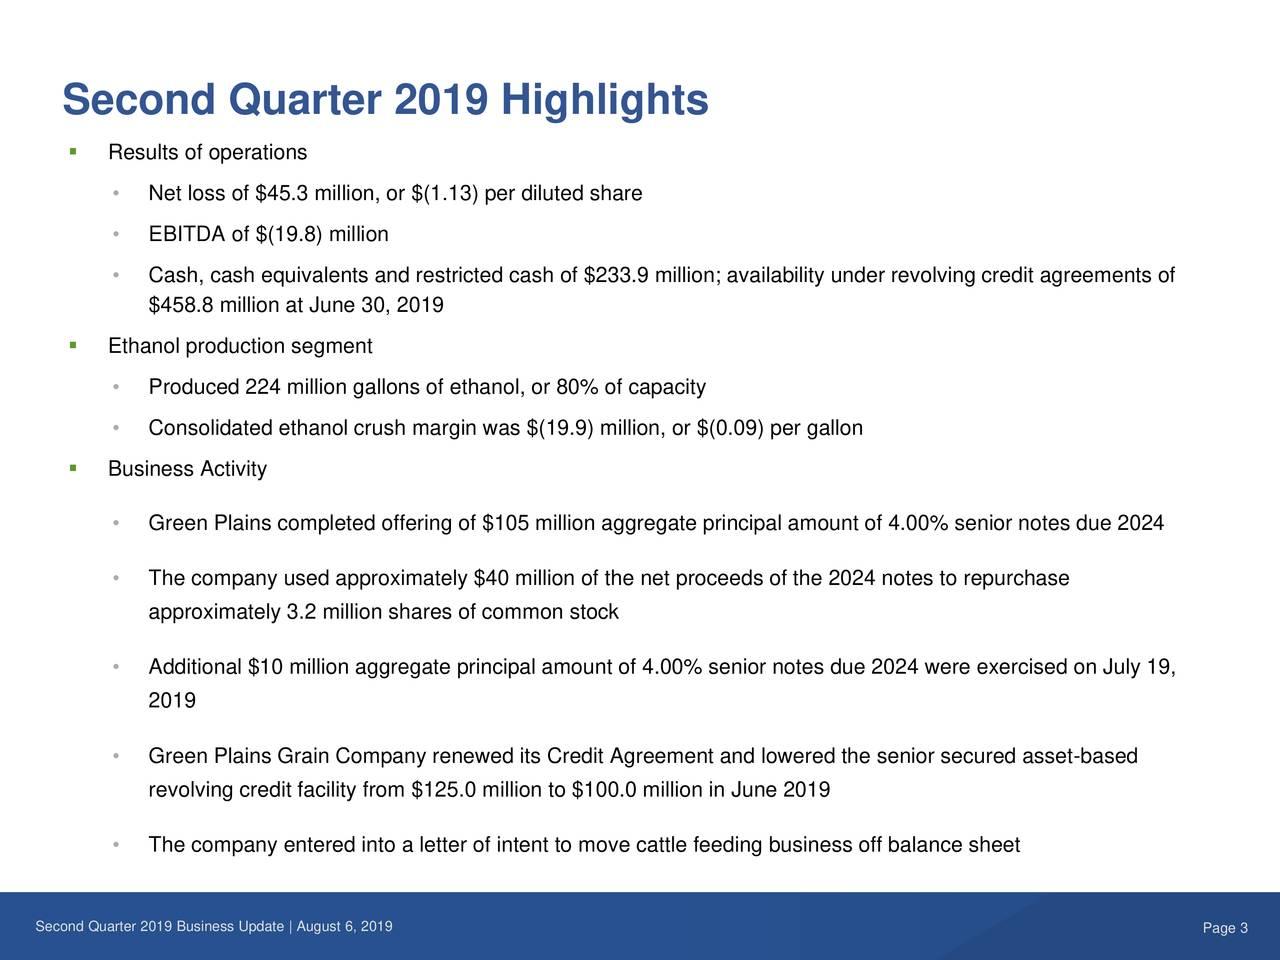 Second Quarter 2019 Highlights